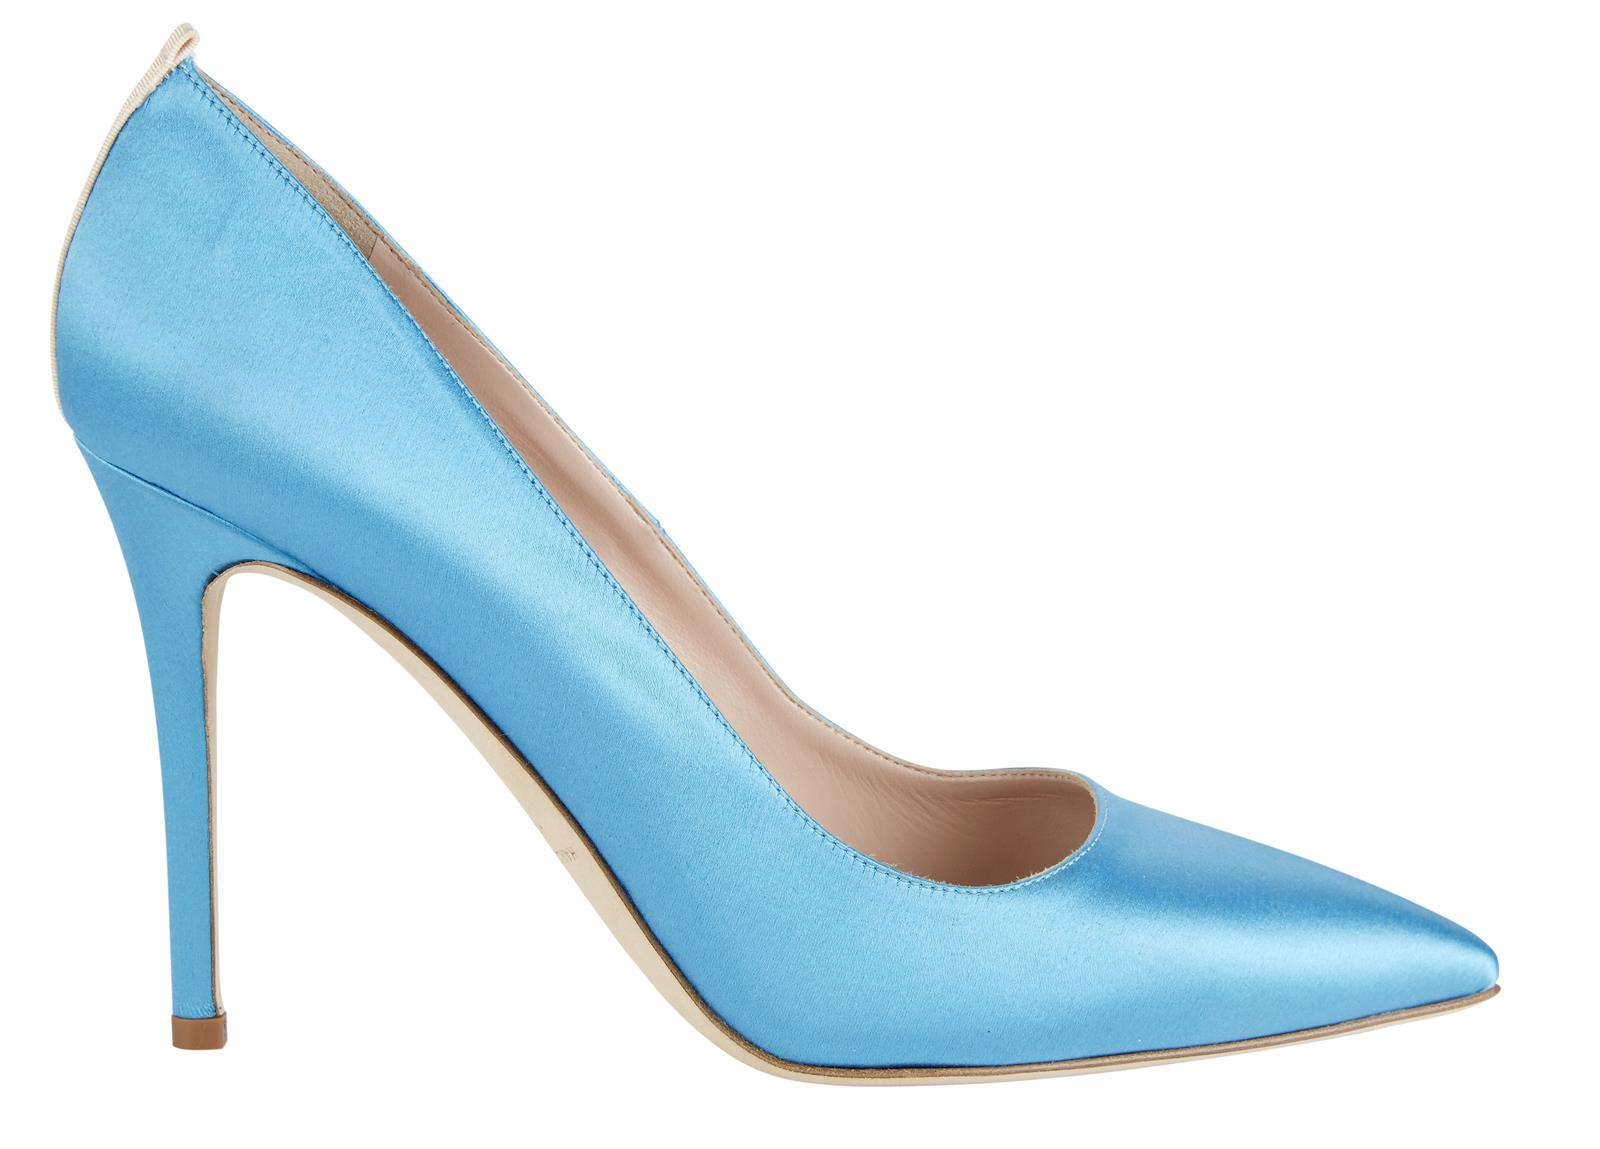 Sarah Jessica Parker per Amazon Fashion